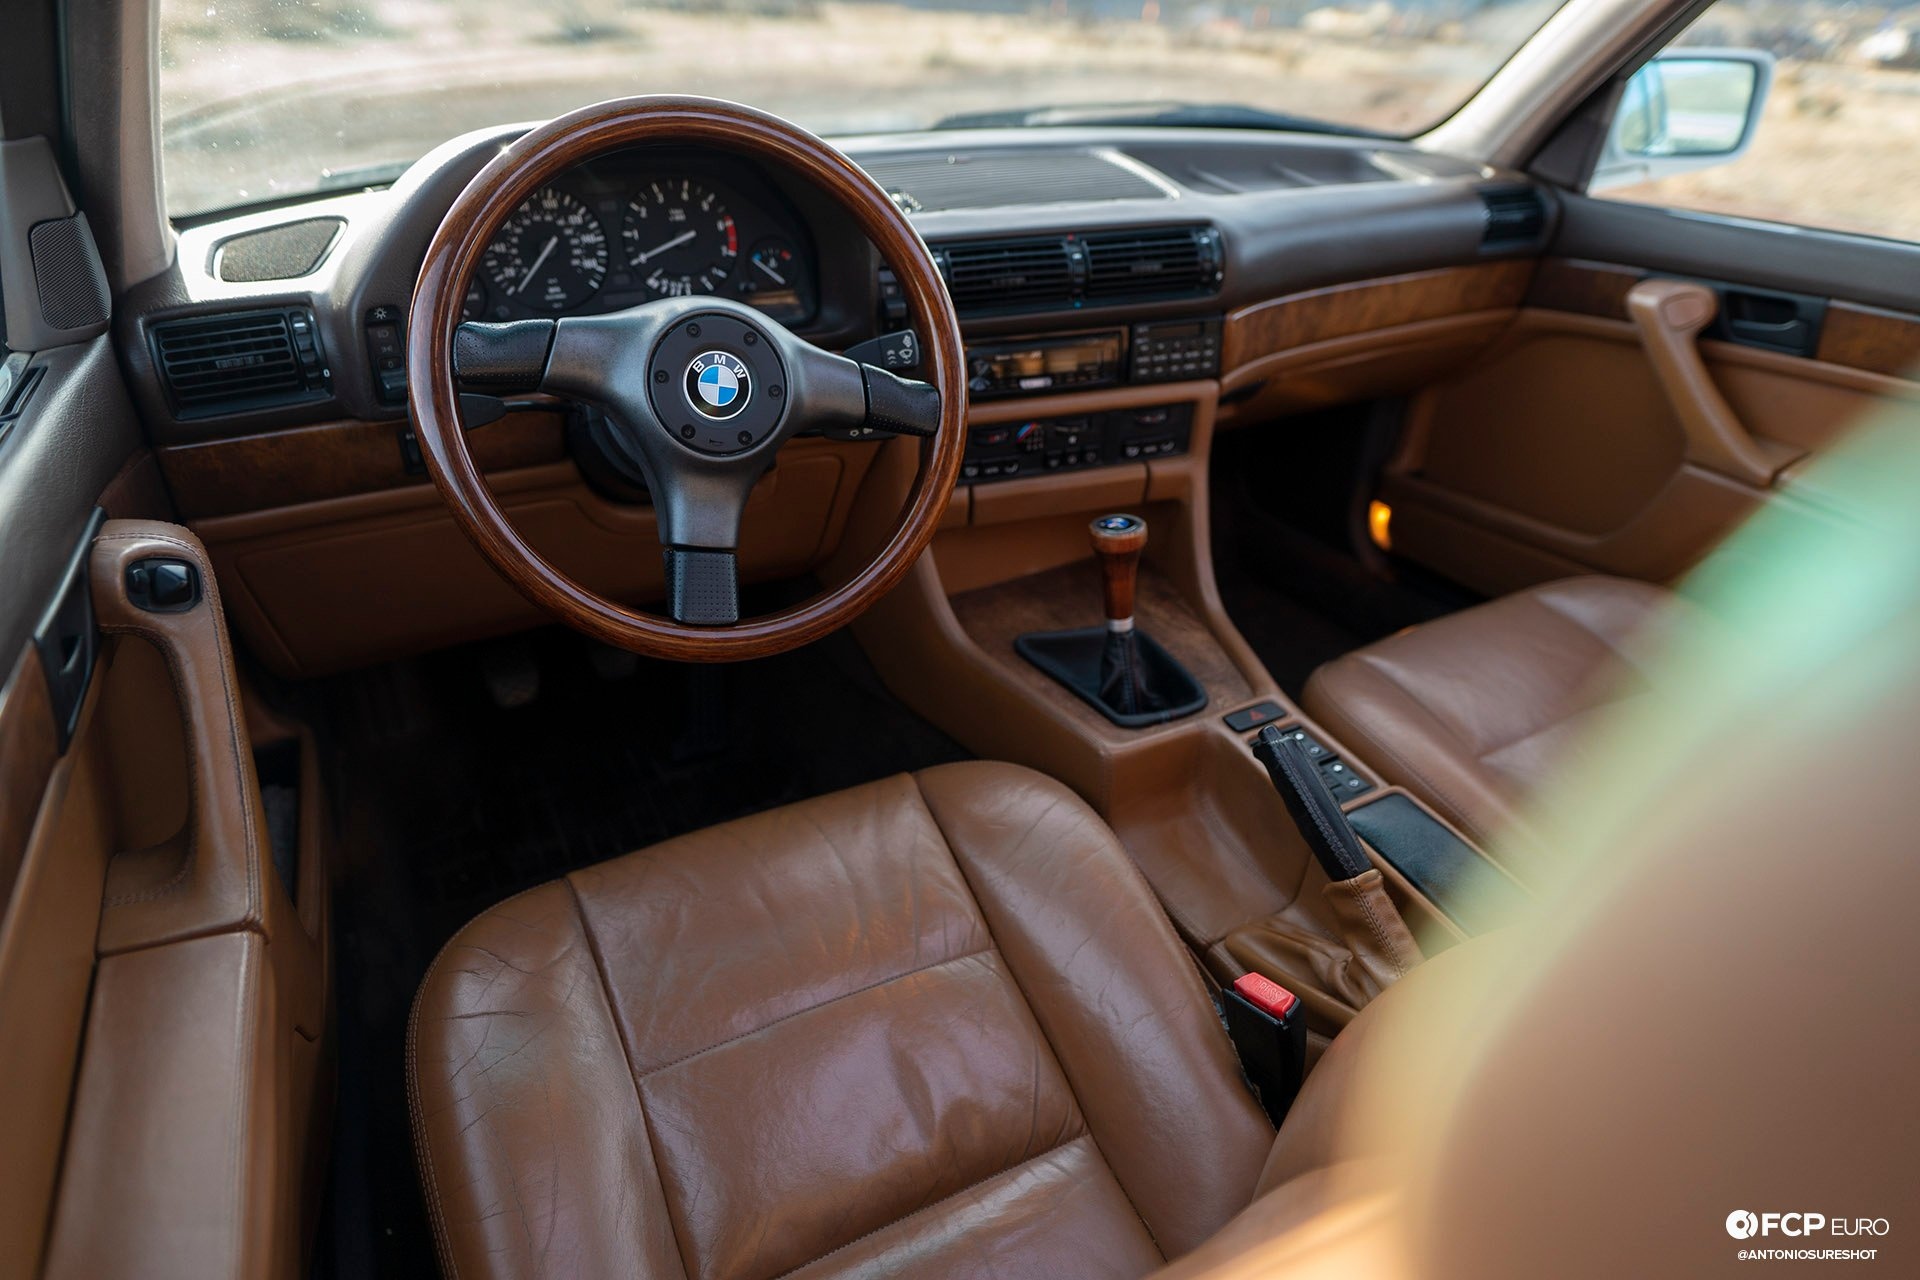 BMW E32 750iL 6 speed A9A02526